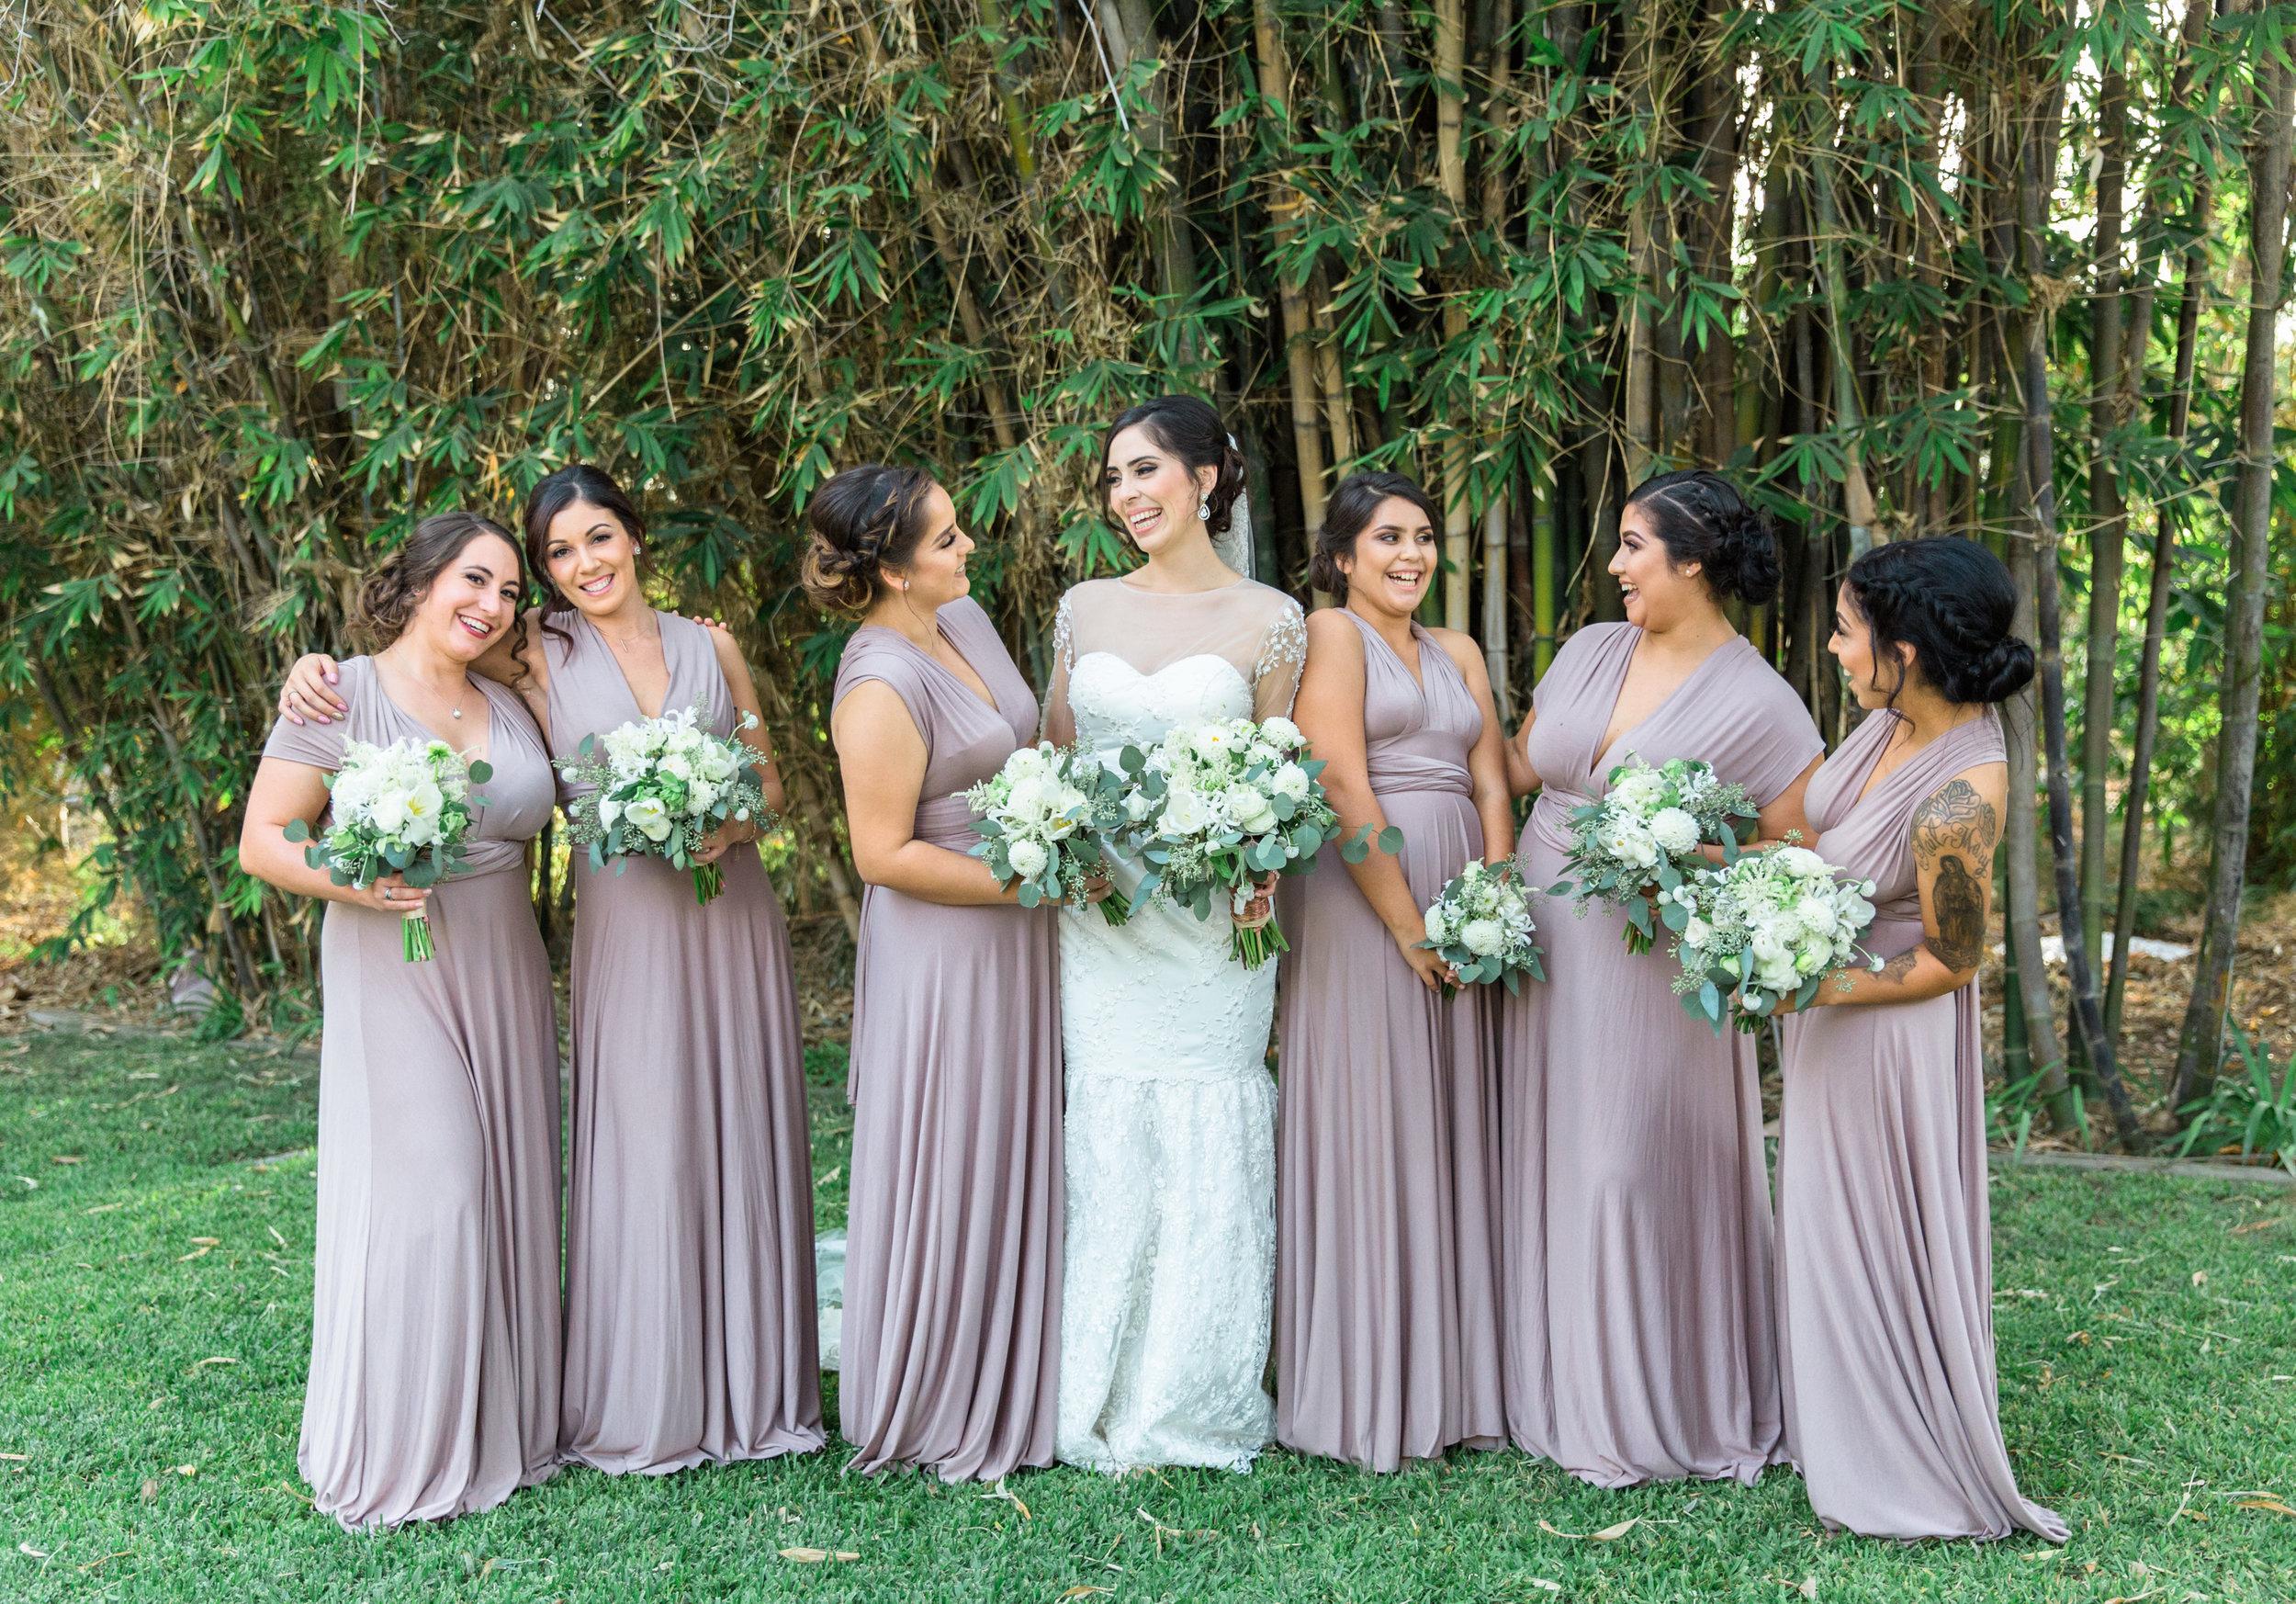 Bonphotage California Wedding Photography